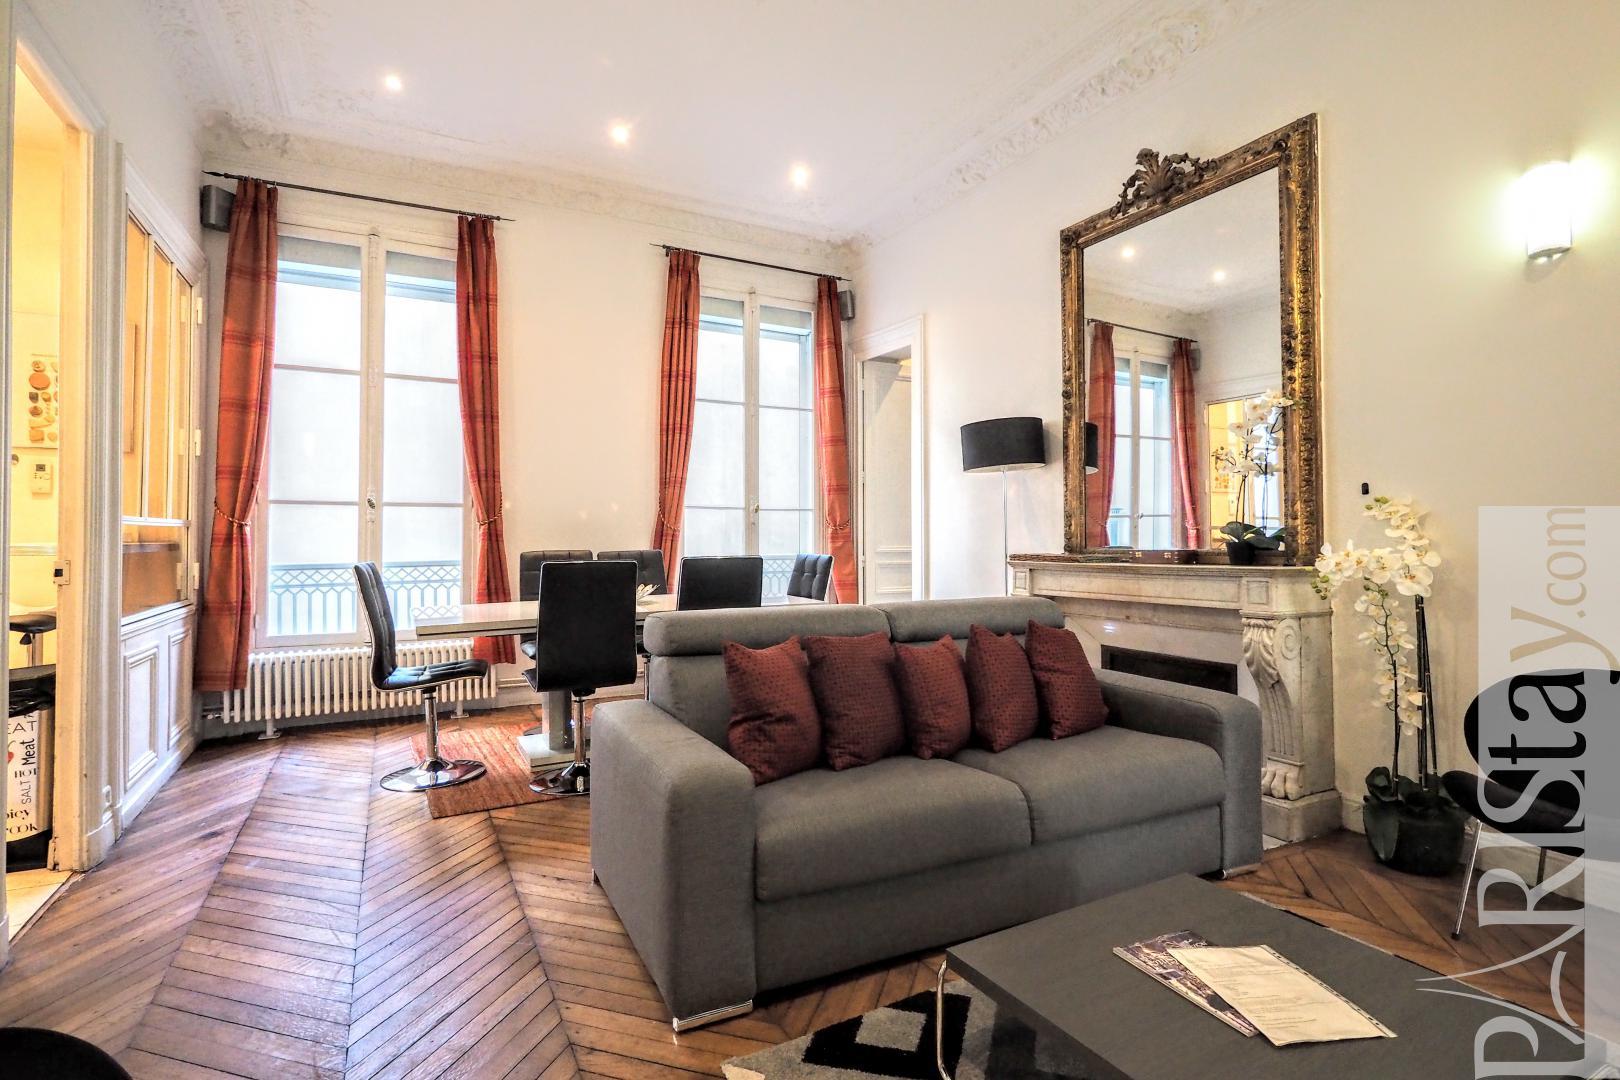 Long Term Rental Paris France Furnished 3 Bedroom Apartment